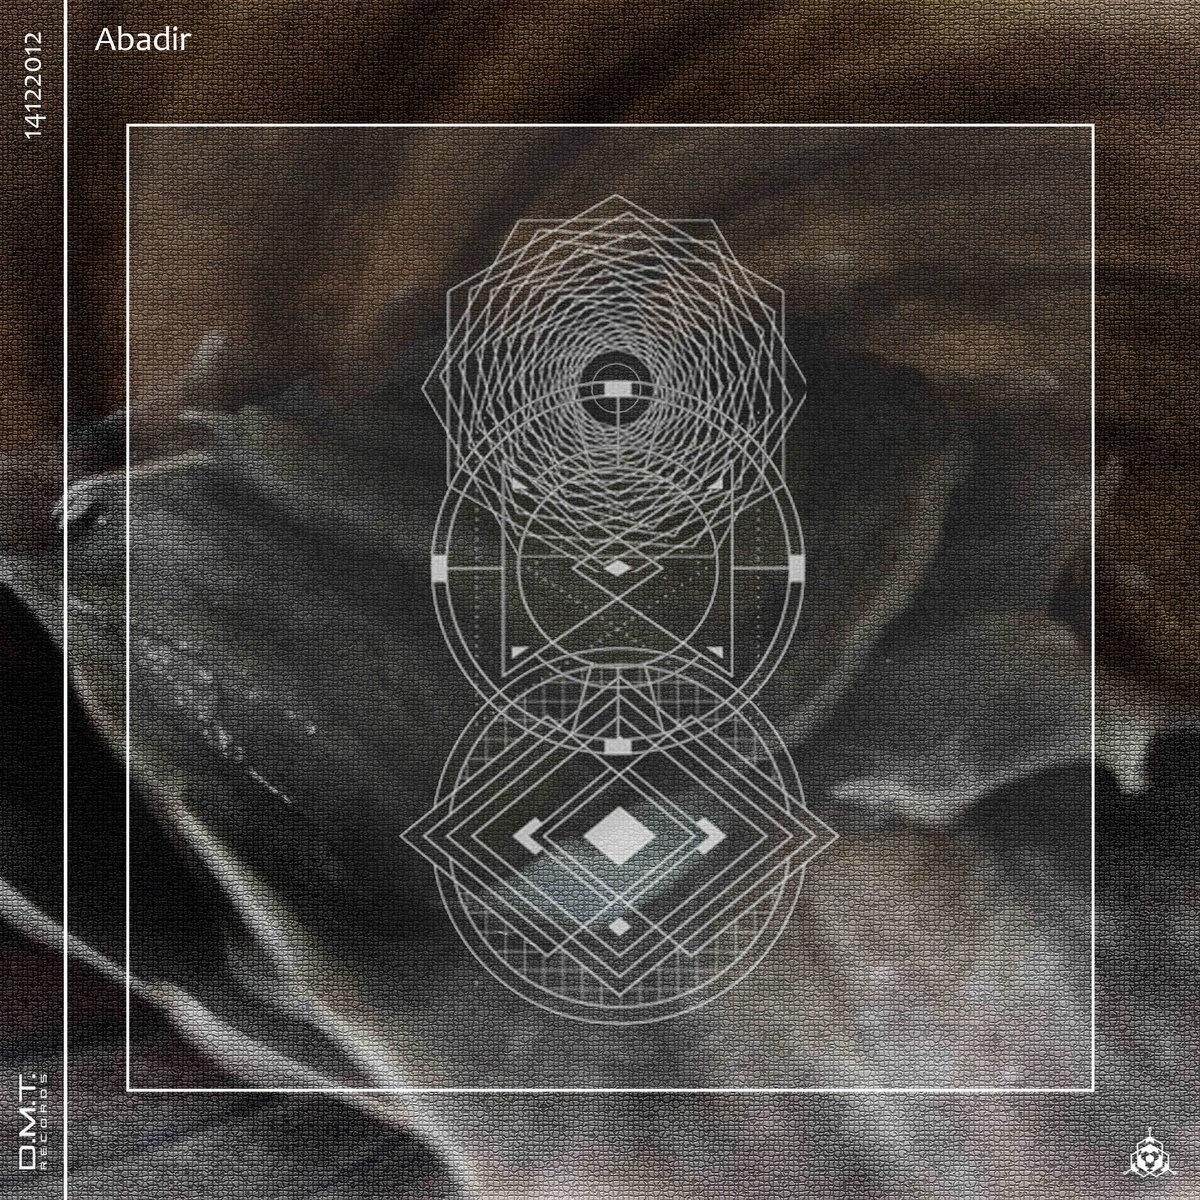 [digital album] Abadir - 141222012